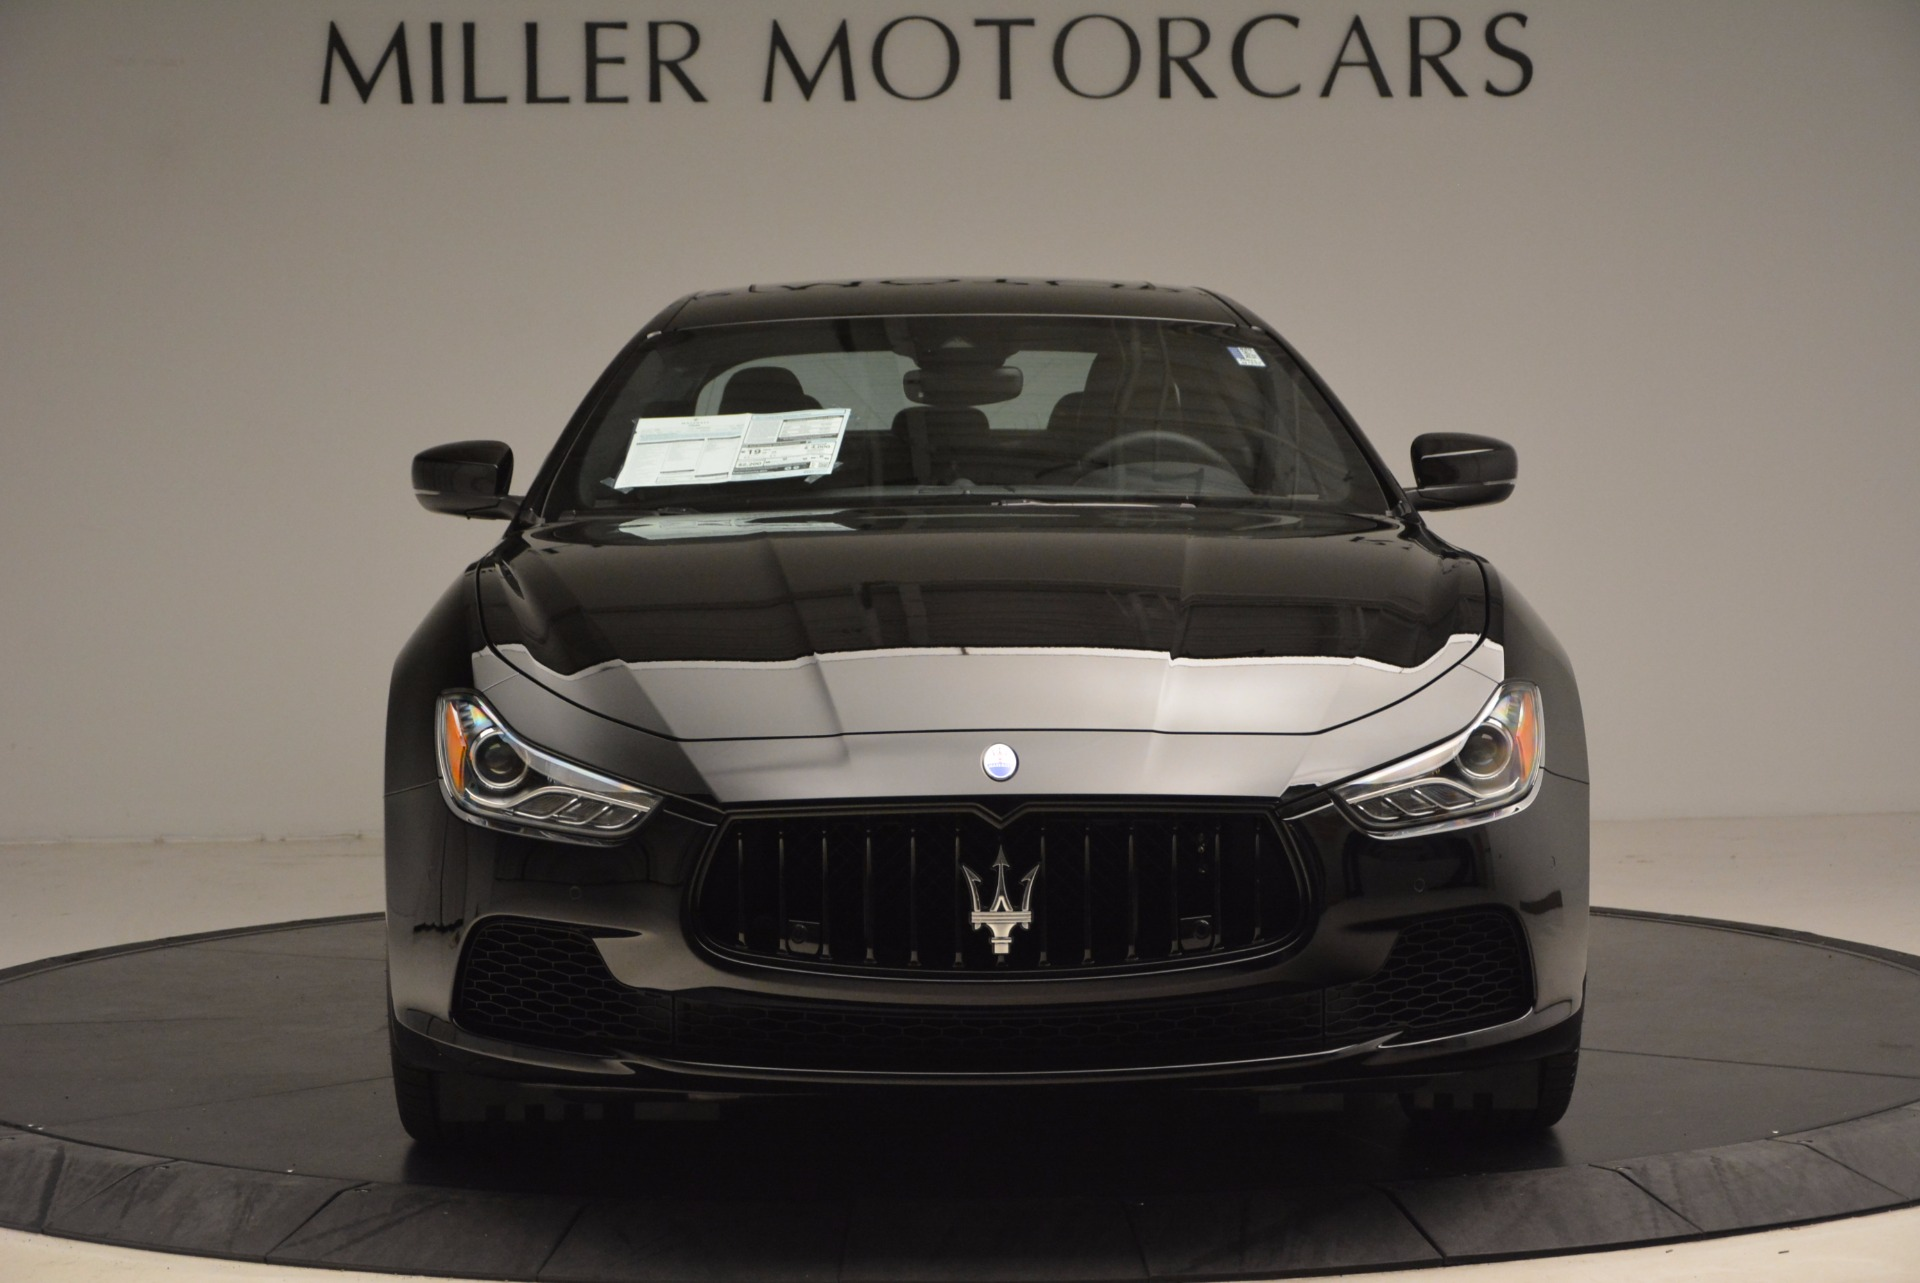 New 2017 Maserati Ghibli Nerissimo Edition S Q4 For Sale In Westport, CT 1419_p12